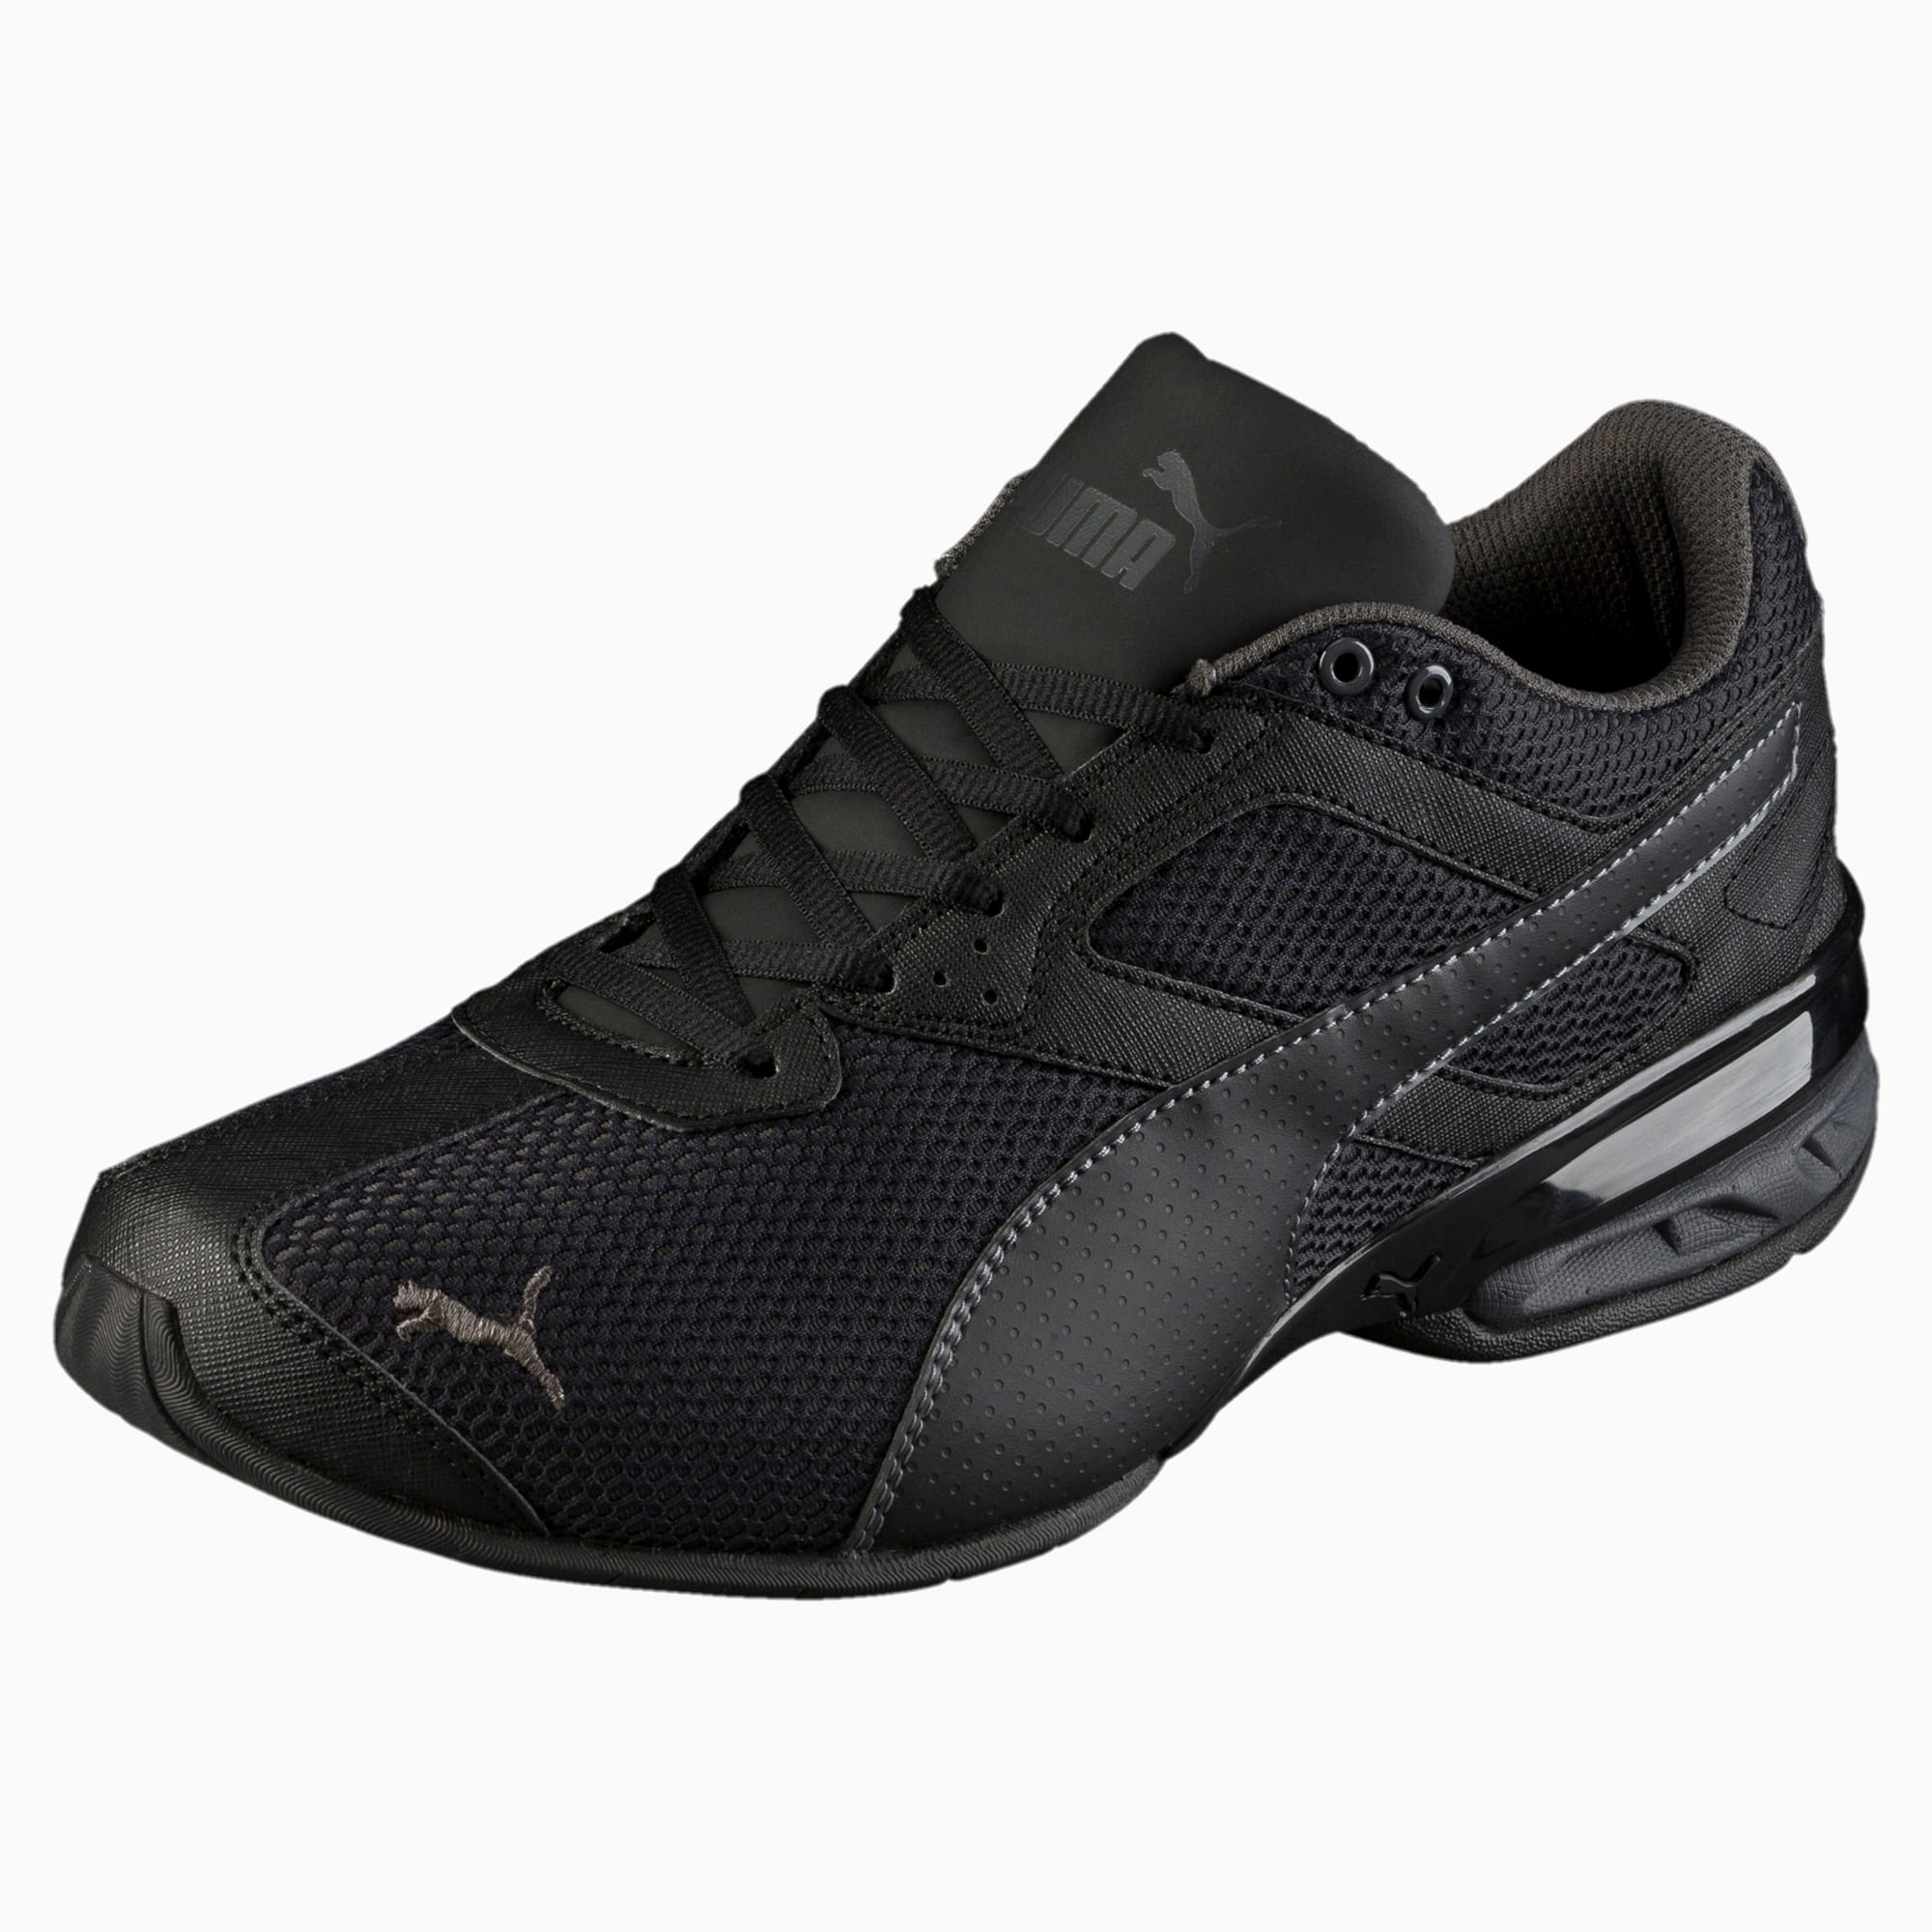 Tazon 6 Mesh Herren Sneaker | Puma Black-Asphalt | PUMA Shoes